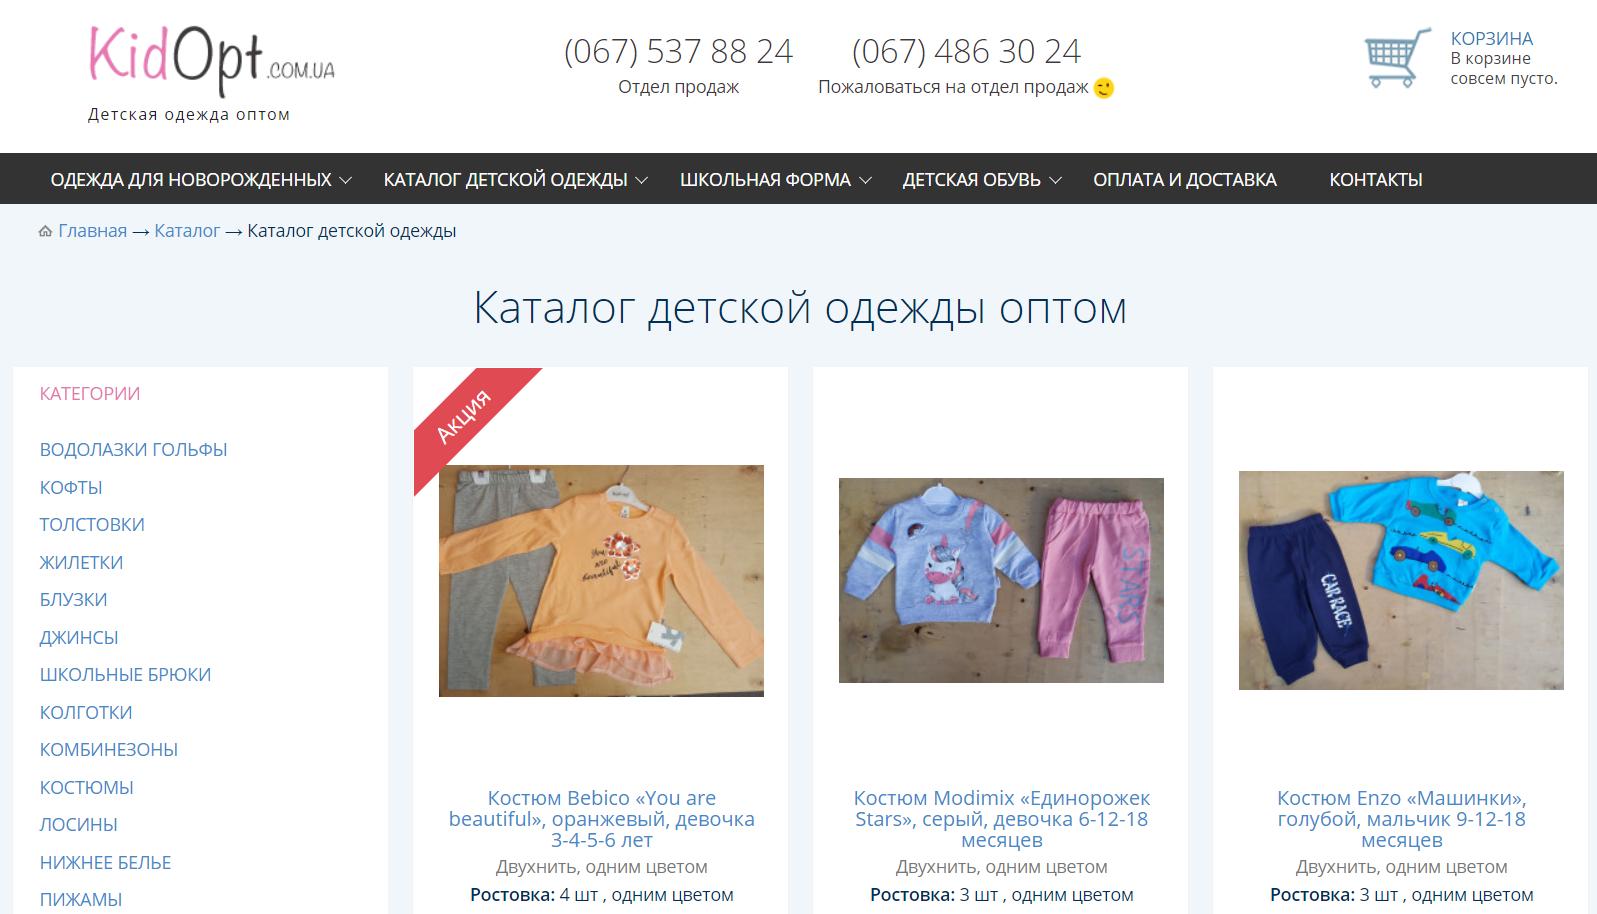 Интернет-магазин компании Kidopt